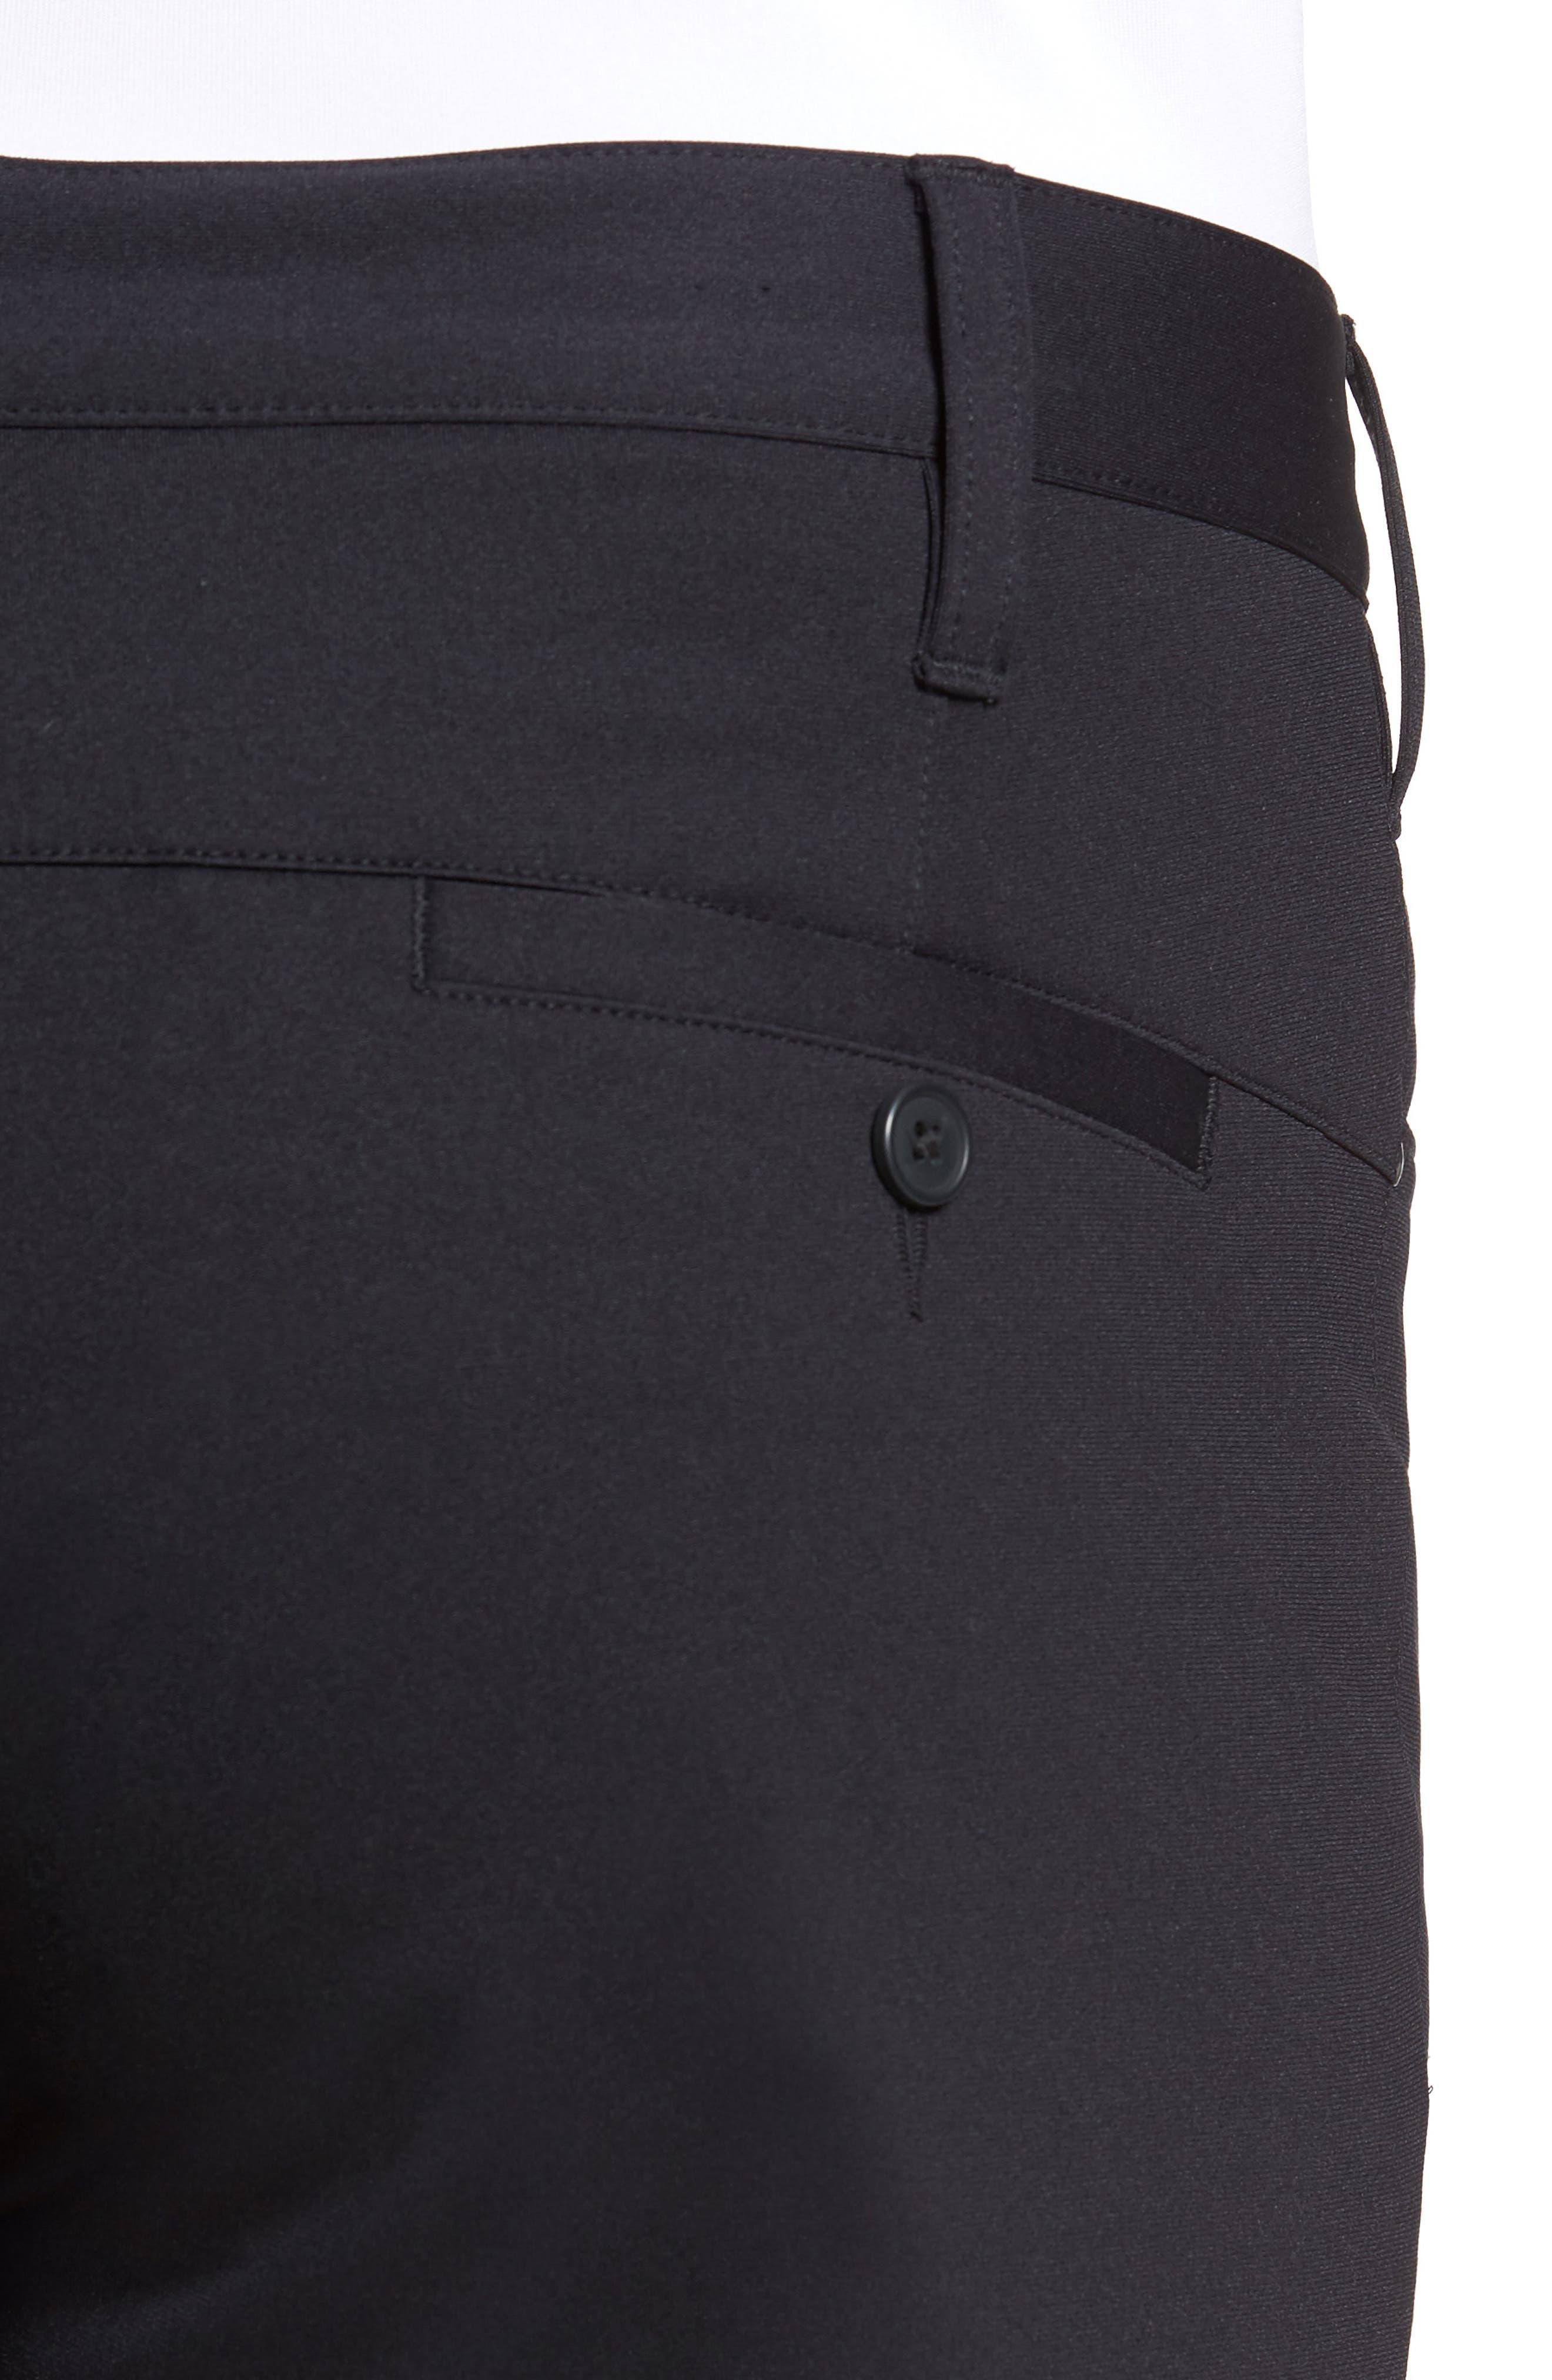 R18 Tech Pants,                             Alternate thumbnail 4, color,                             BLACK